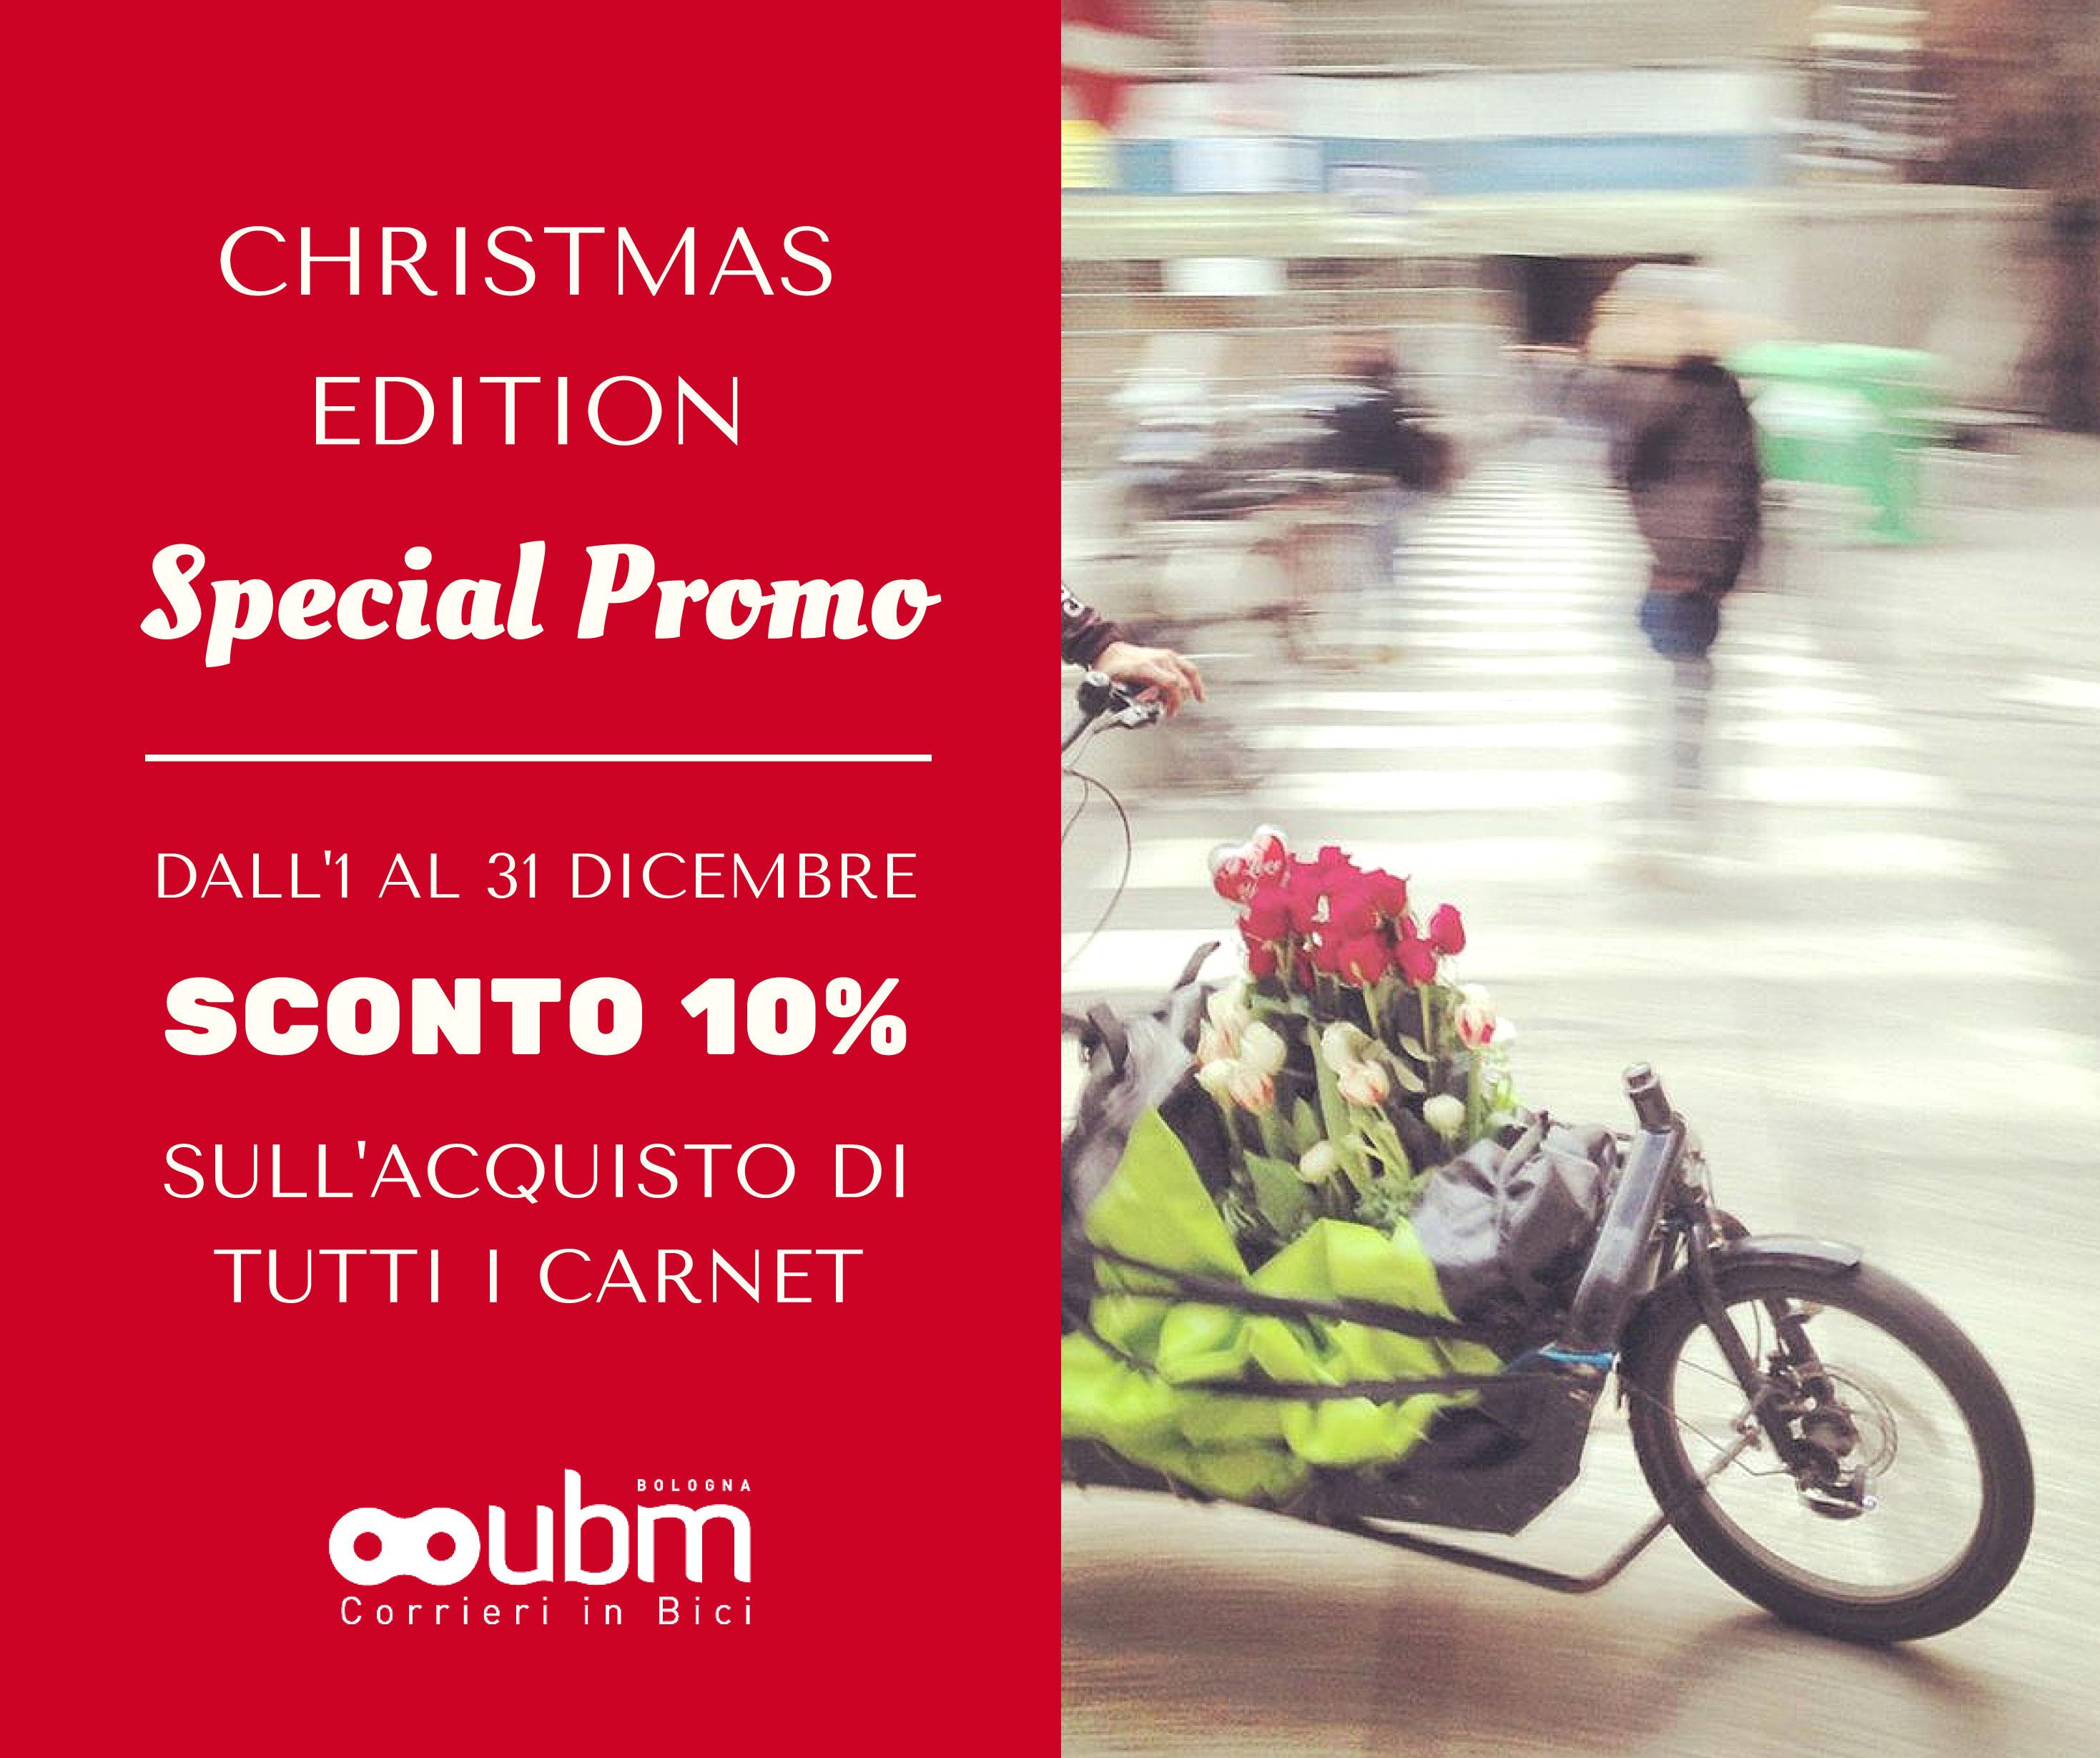 CHRISTMAS-EDITION-Special-promo-UBM.jpeg